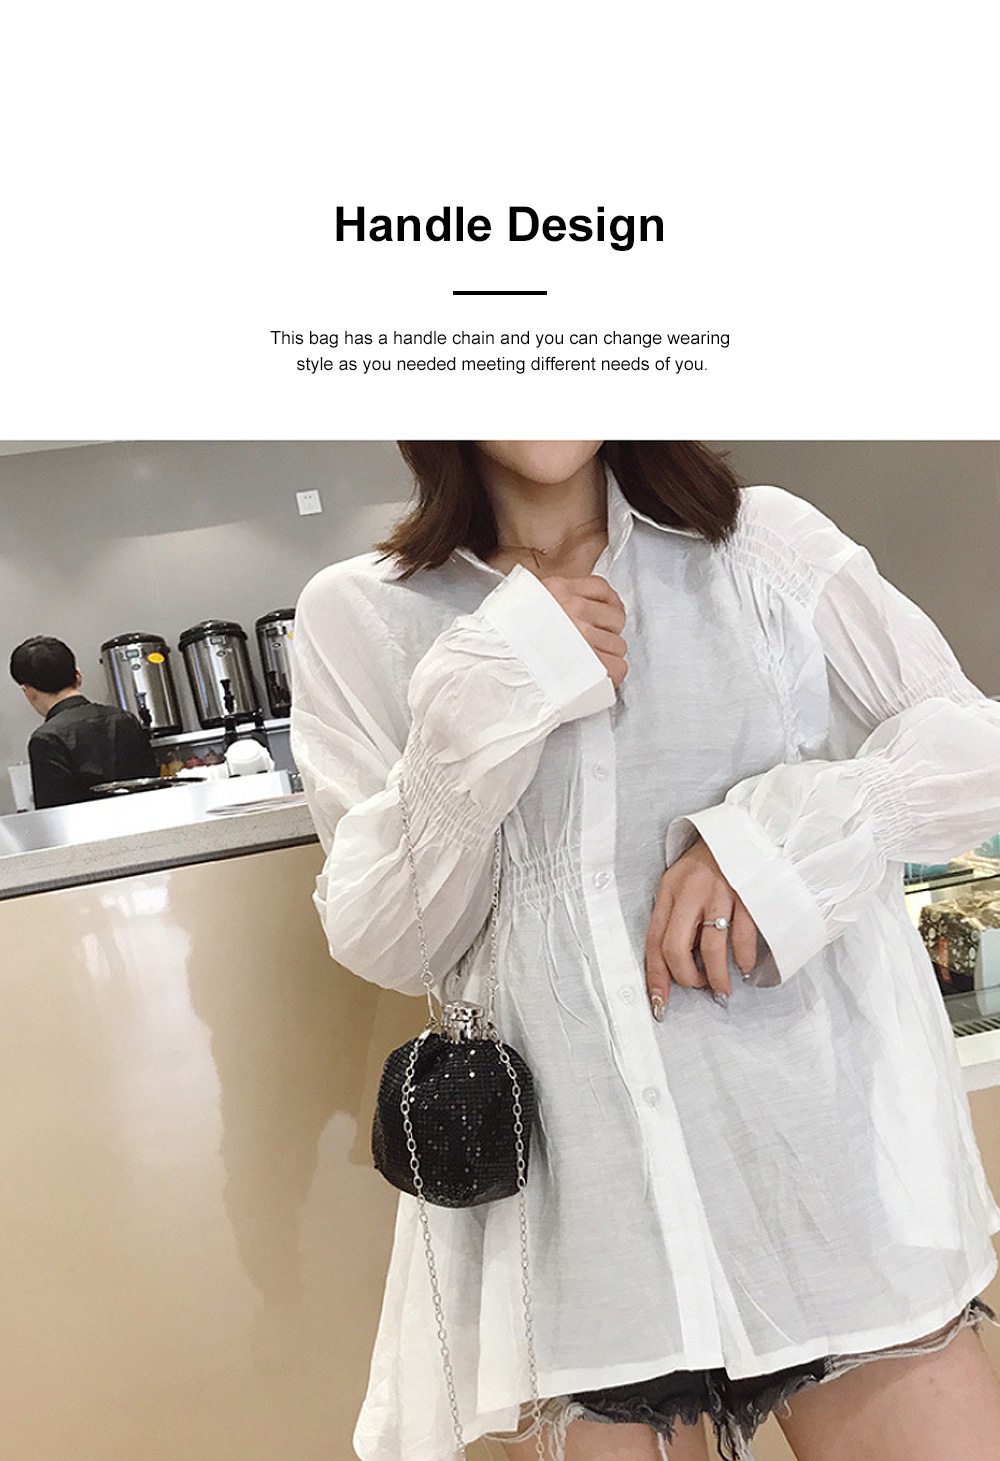 Creative Shiny Aluminum Slices Kettle Model Lady Shoulder Bag, Fashion Stylish Wine Pot Jar Hand Bag for Women 1